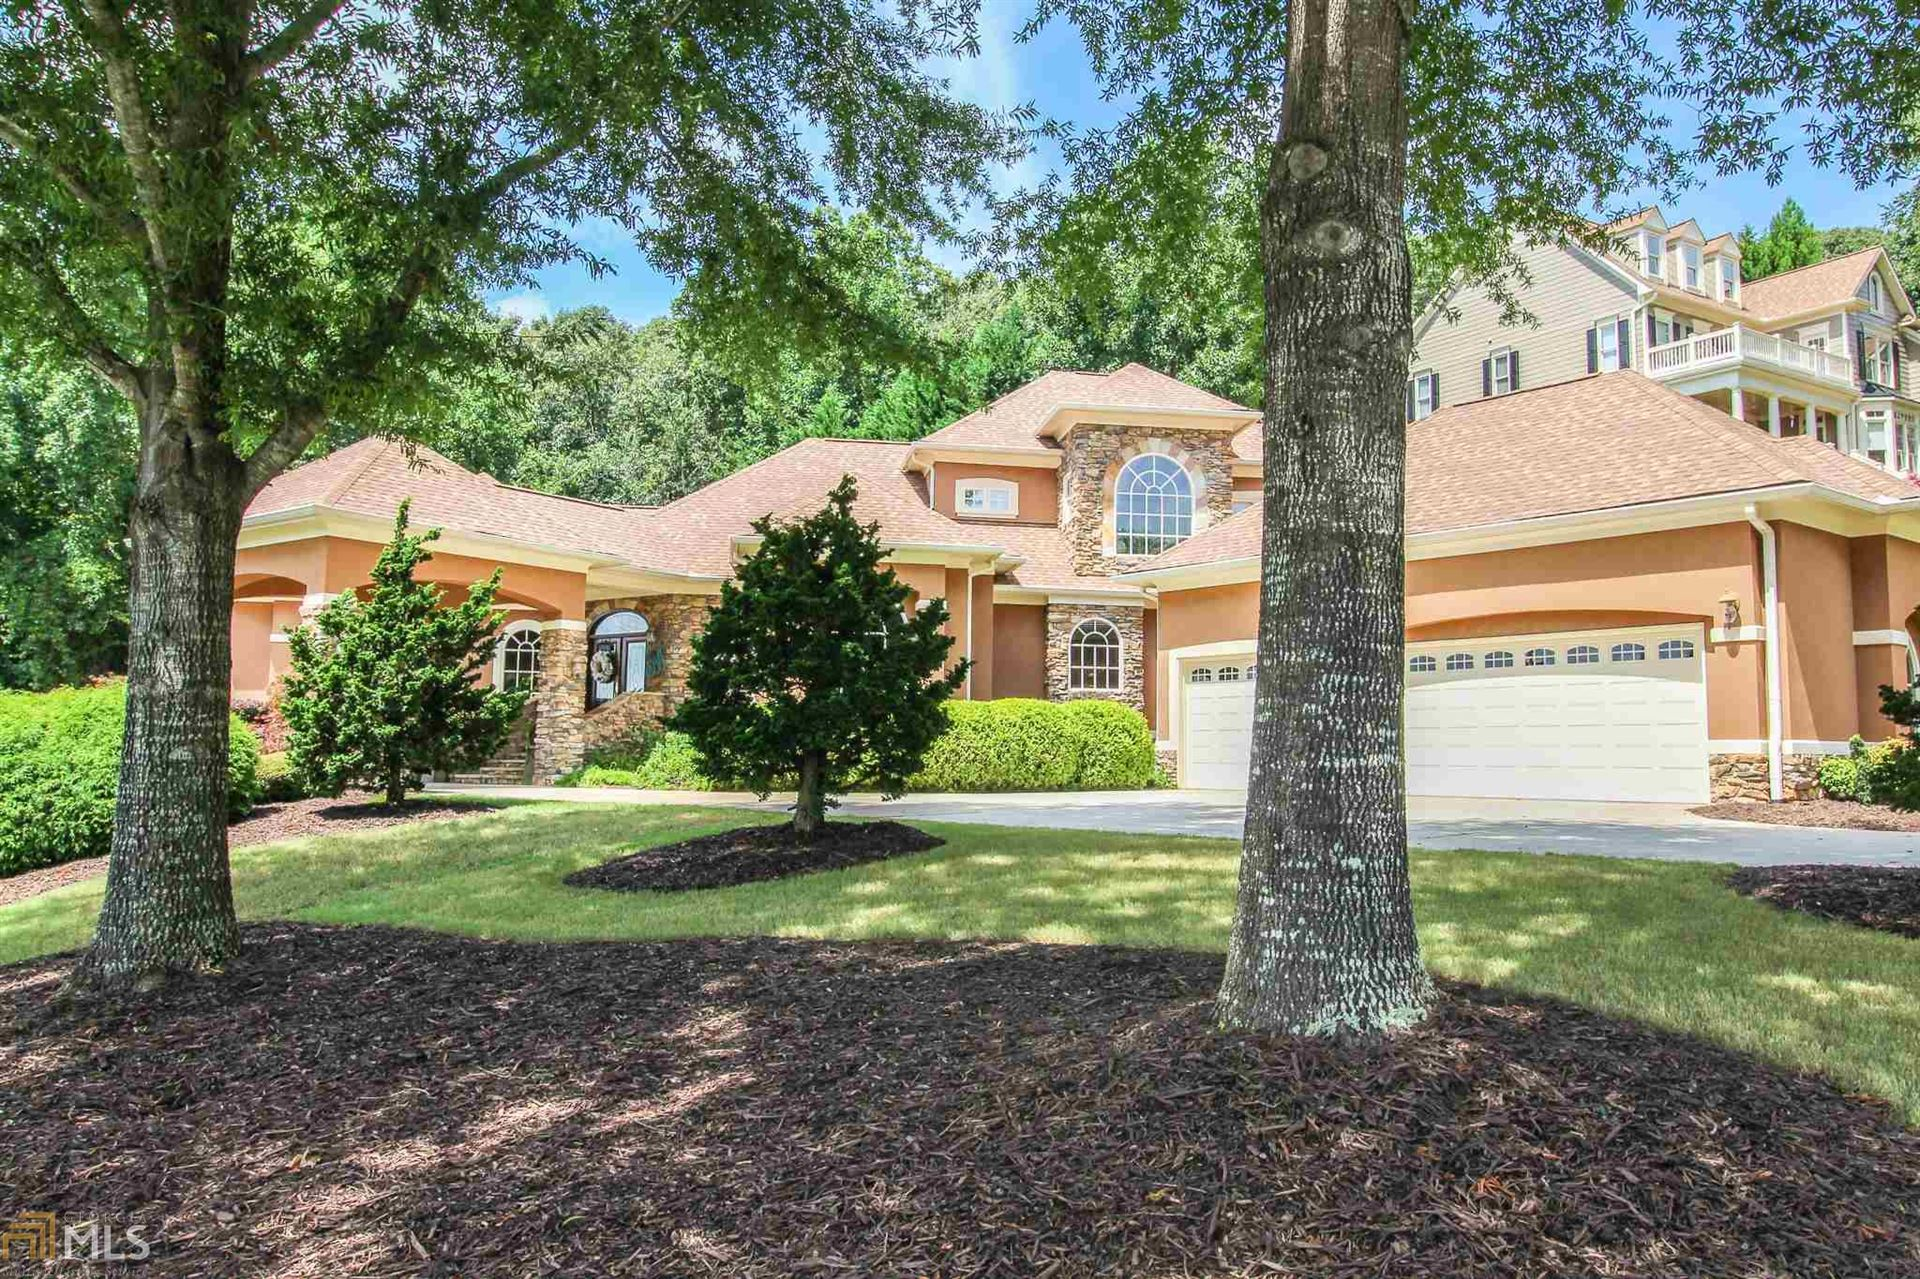 3519 River Haven Ct, Gainesville, GA 30506 - MLS#: 8735934